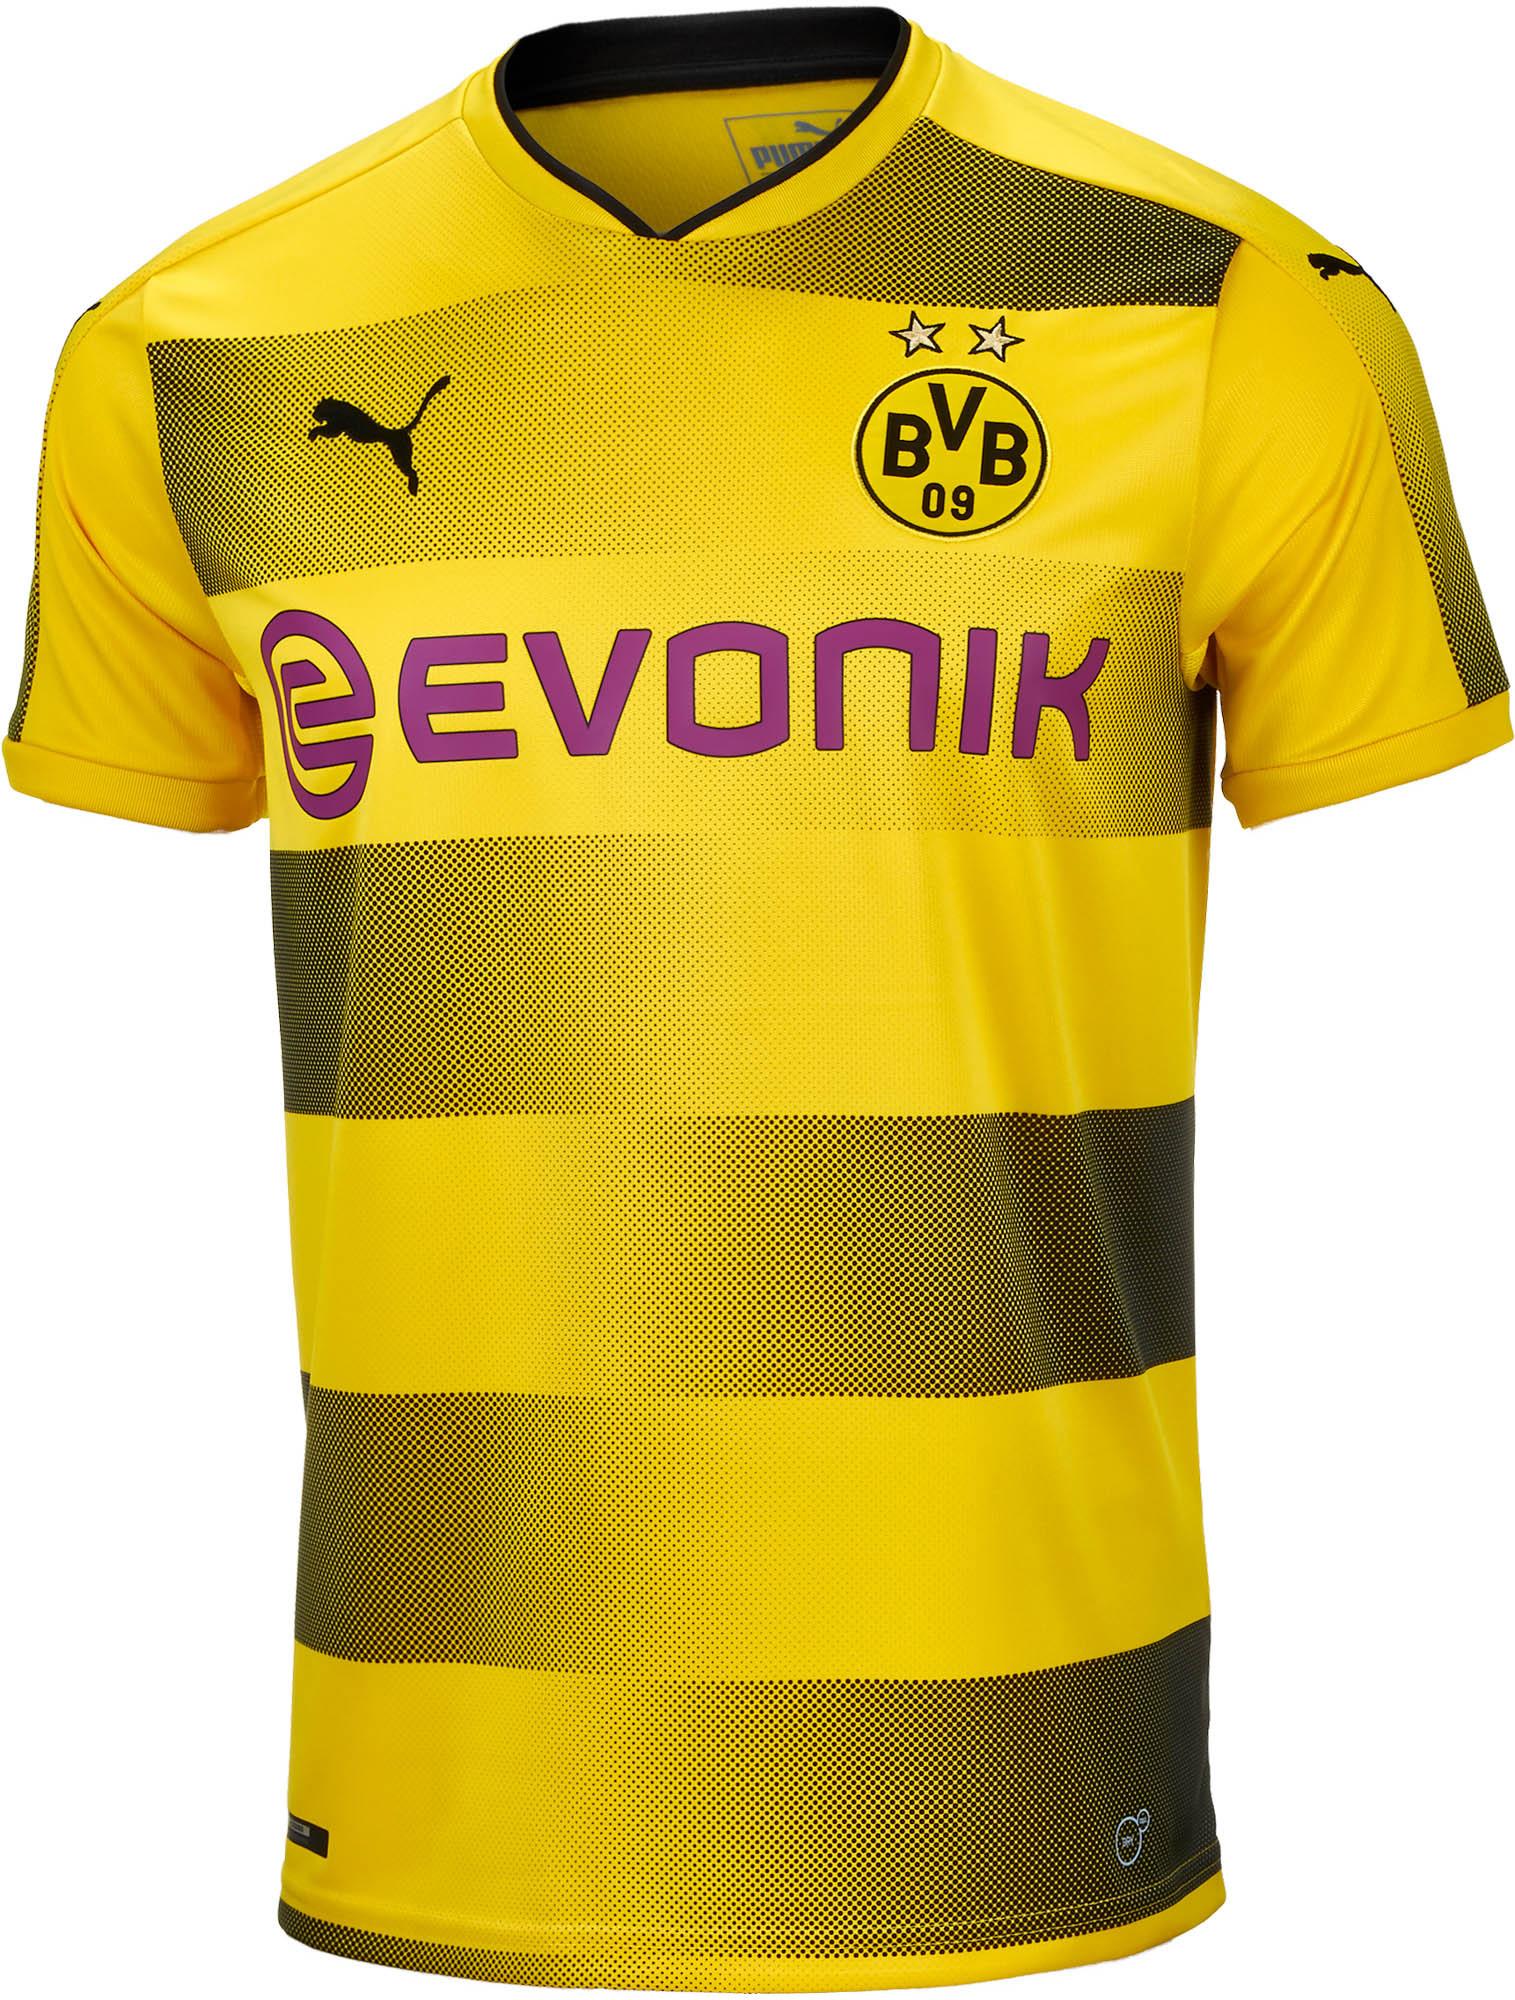 ca7a0f507 Puma Borussia Dortmund Home Jersey 2017-18 - Soccer Master